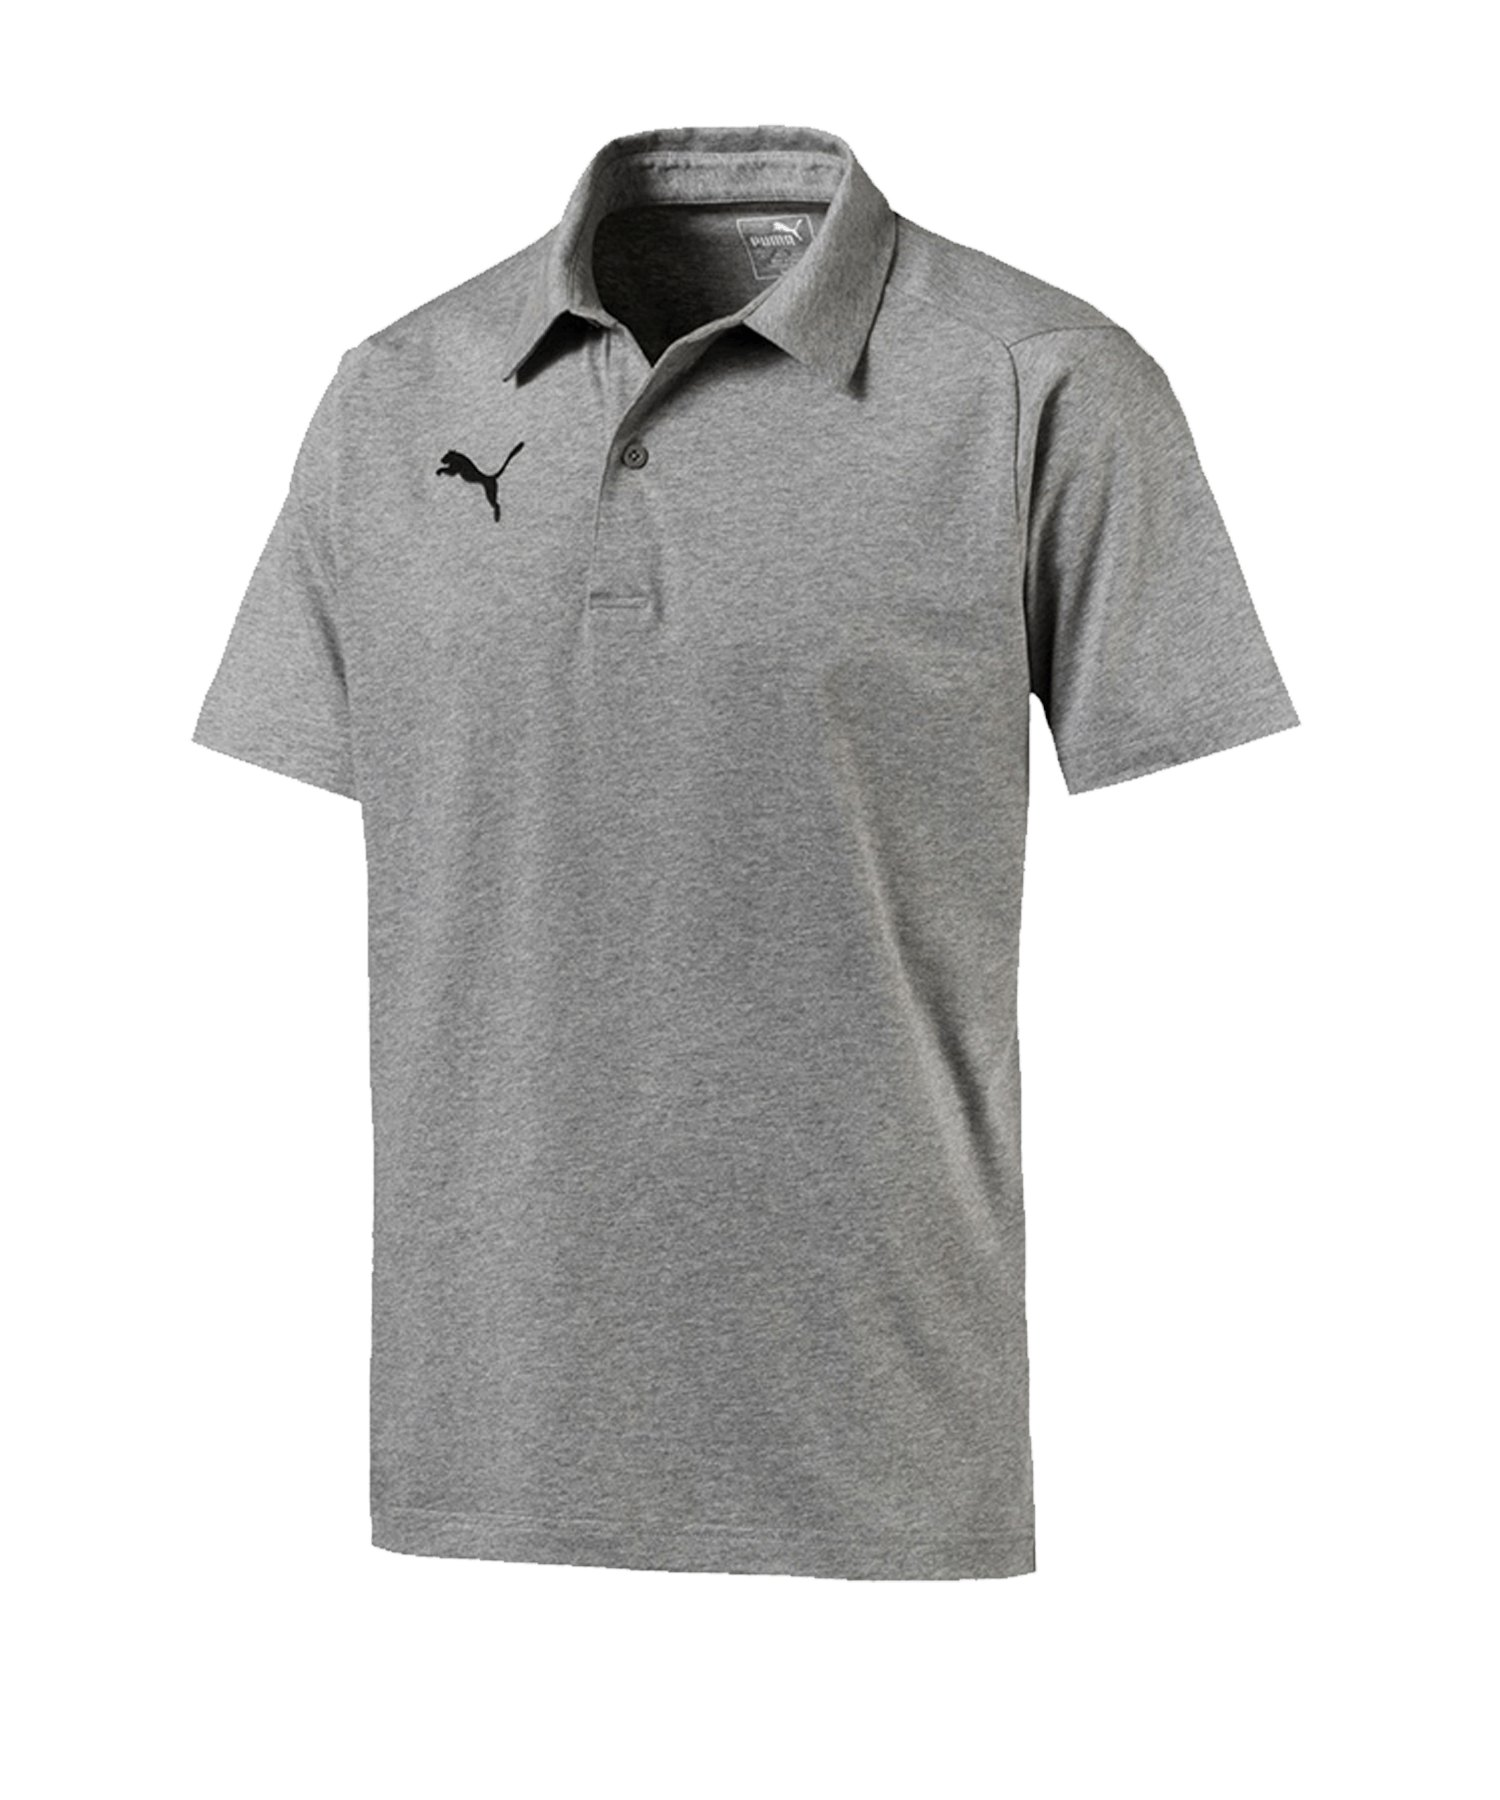 PUMA LIGA Casuals Poloshirt Grau F33 - grau